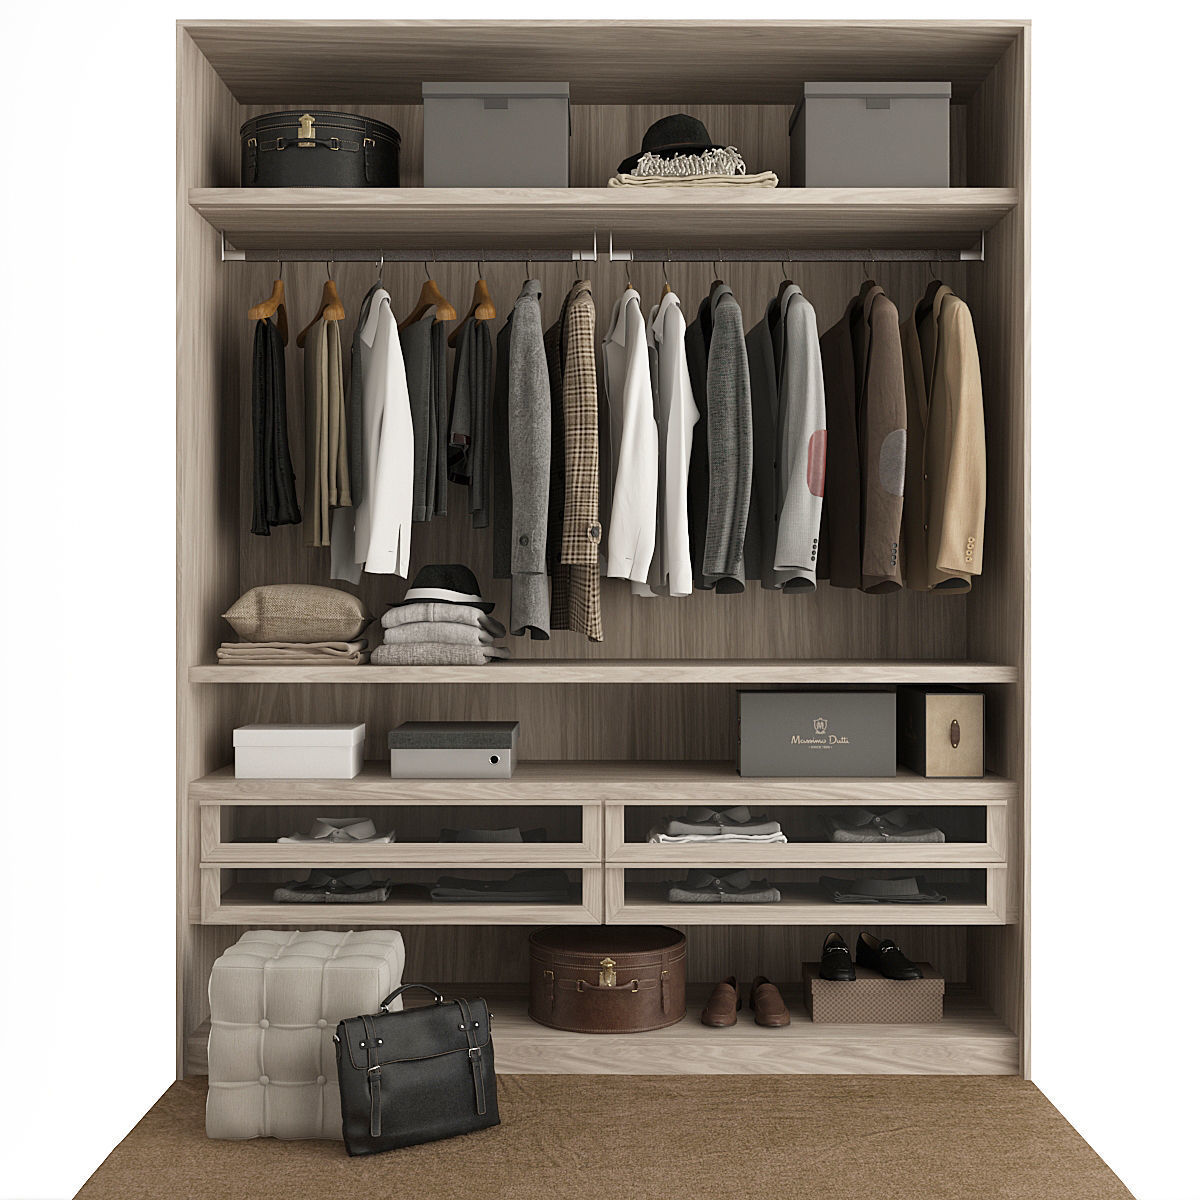 Clothing for Wardrobe